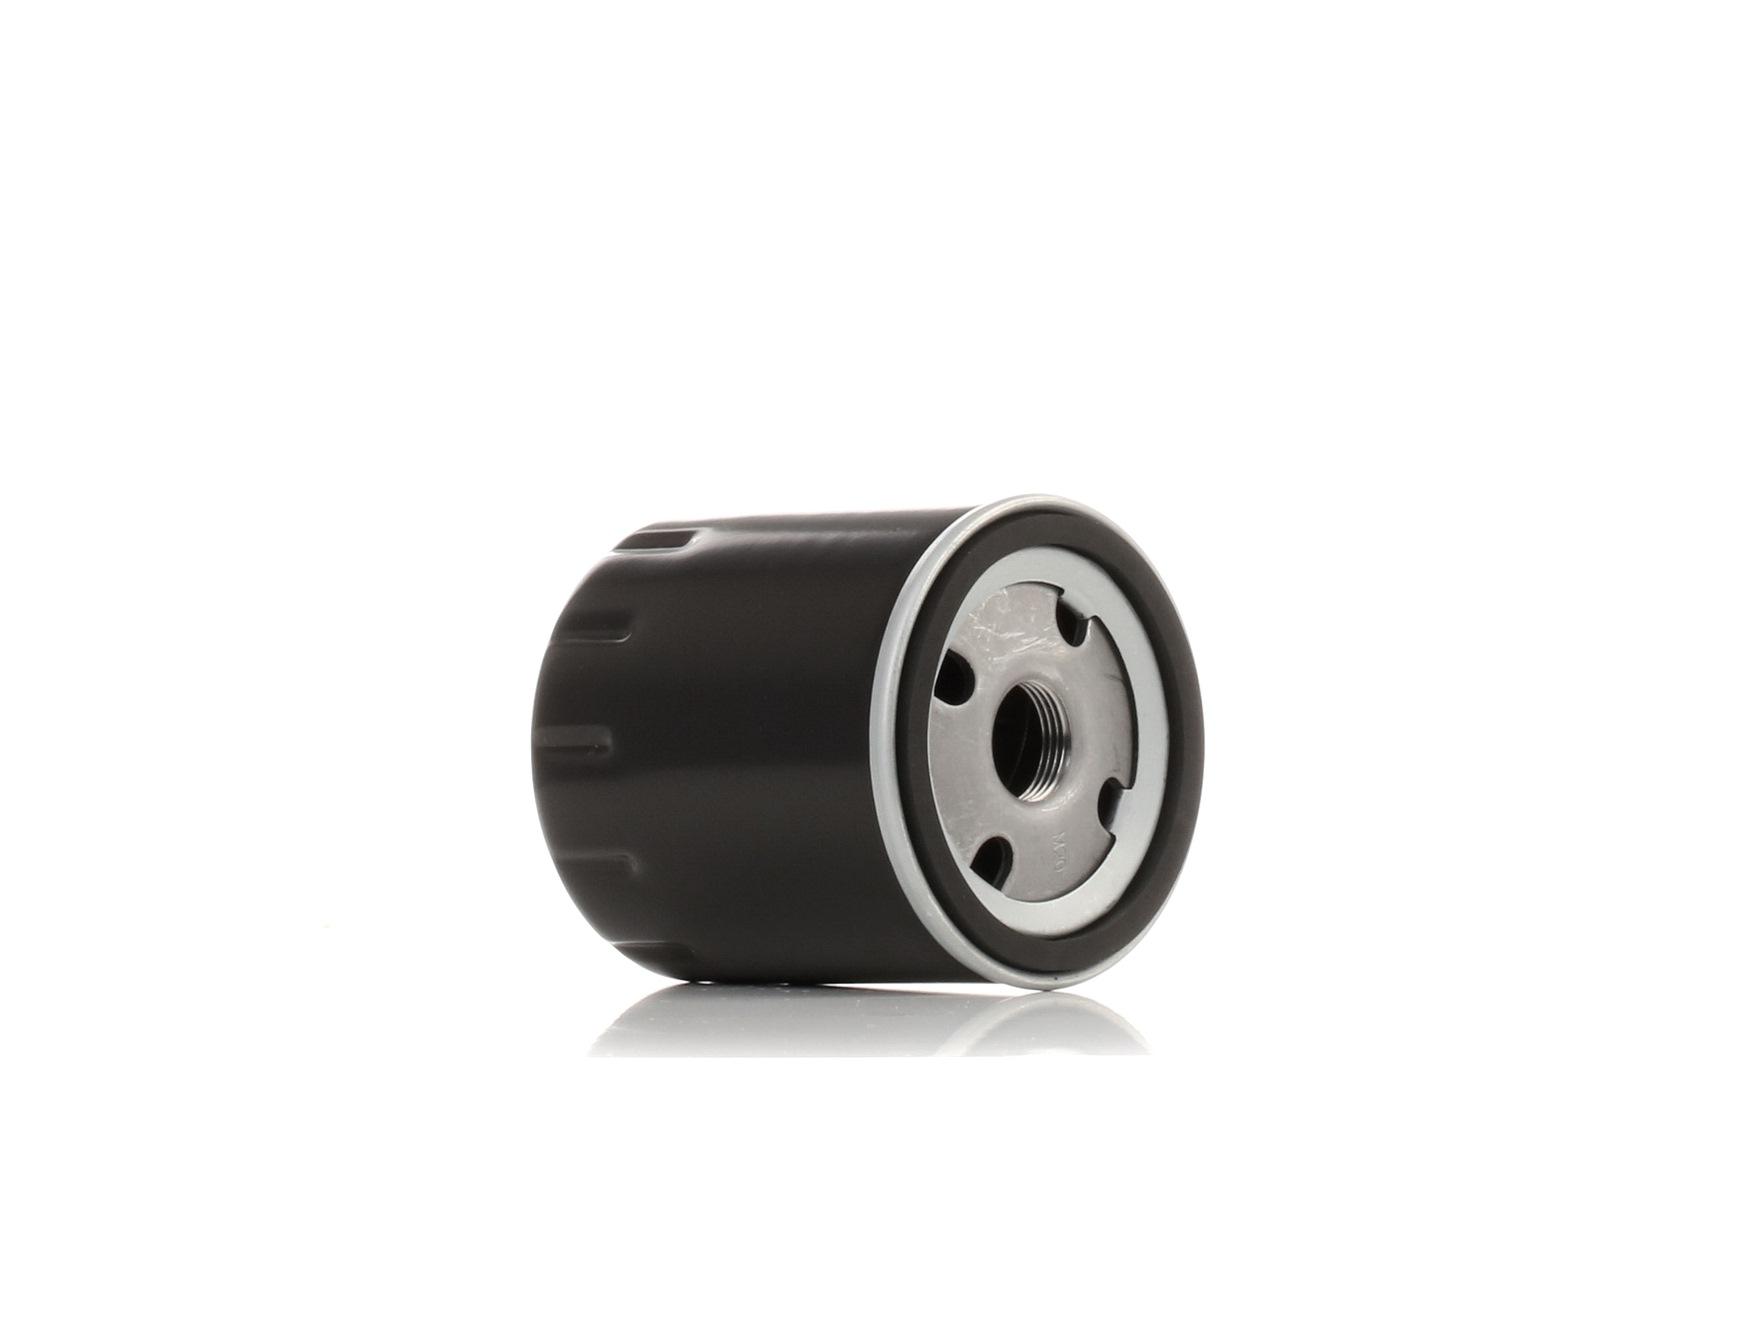 Origine Filtre à huile STARK SKOF-0860004 (Ø: 79,0mm, Hauteur: 89,0mm)